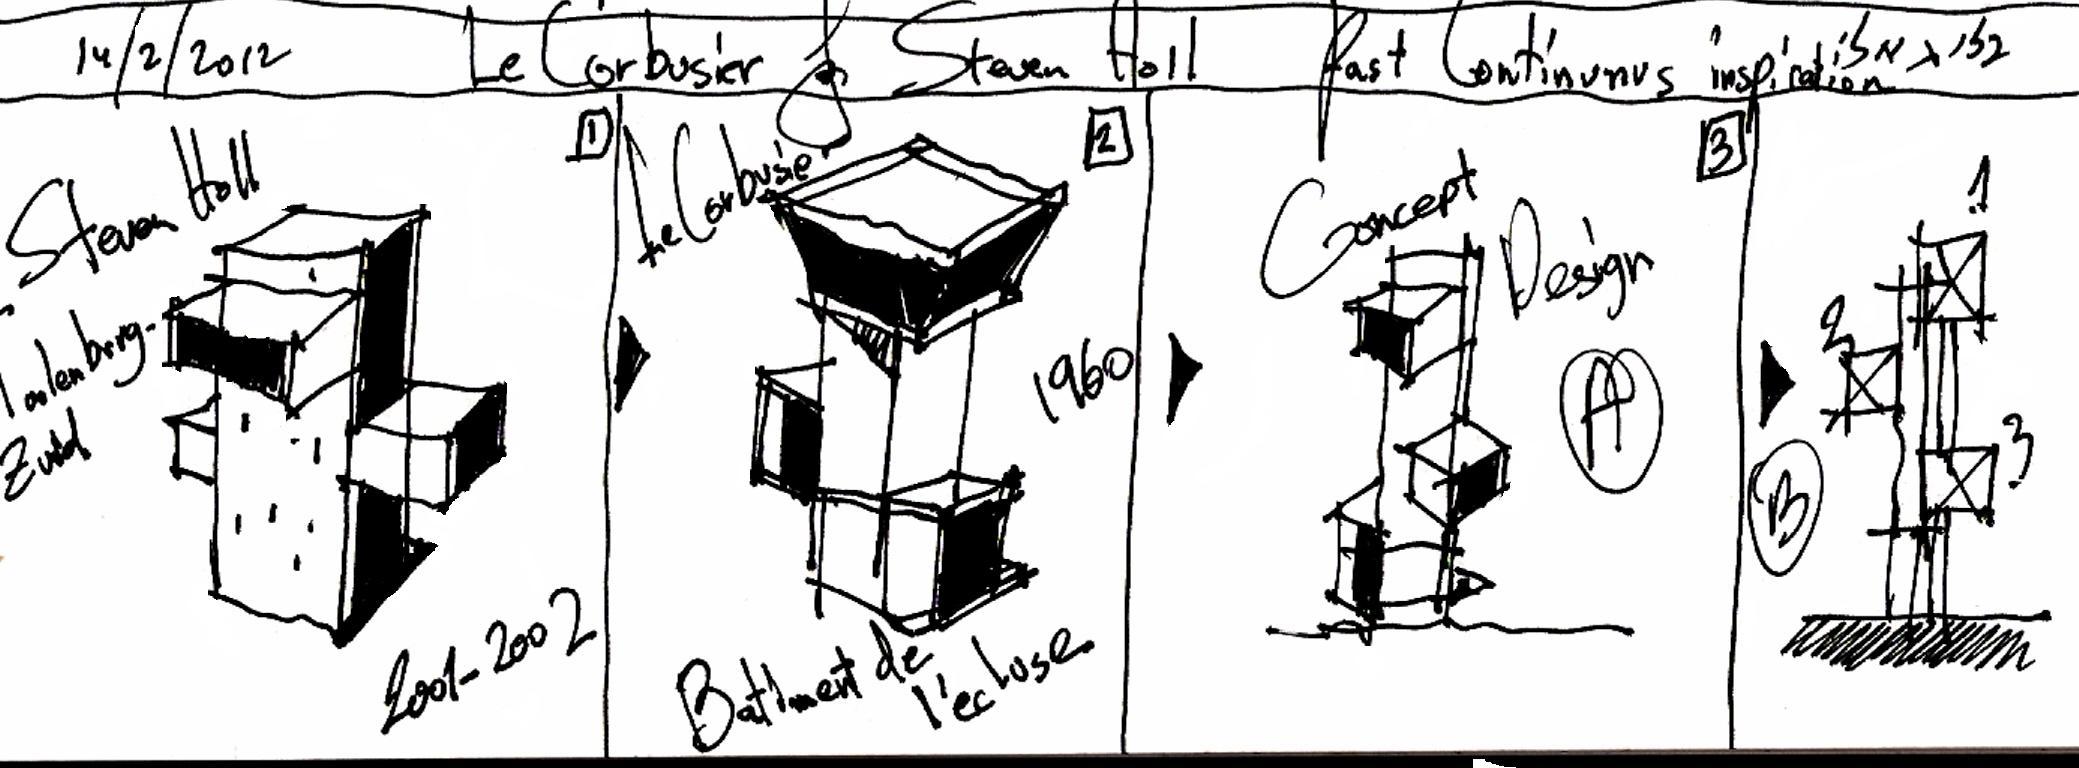 le-corbusier-steven-holl-eliinbar-sketch-book-20110001